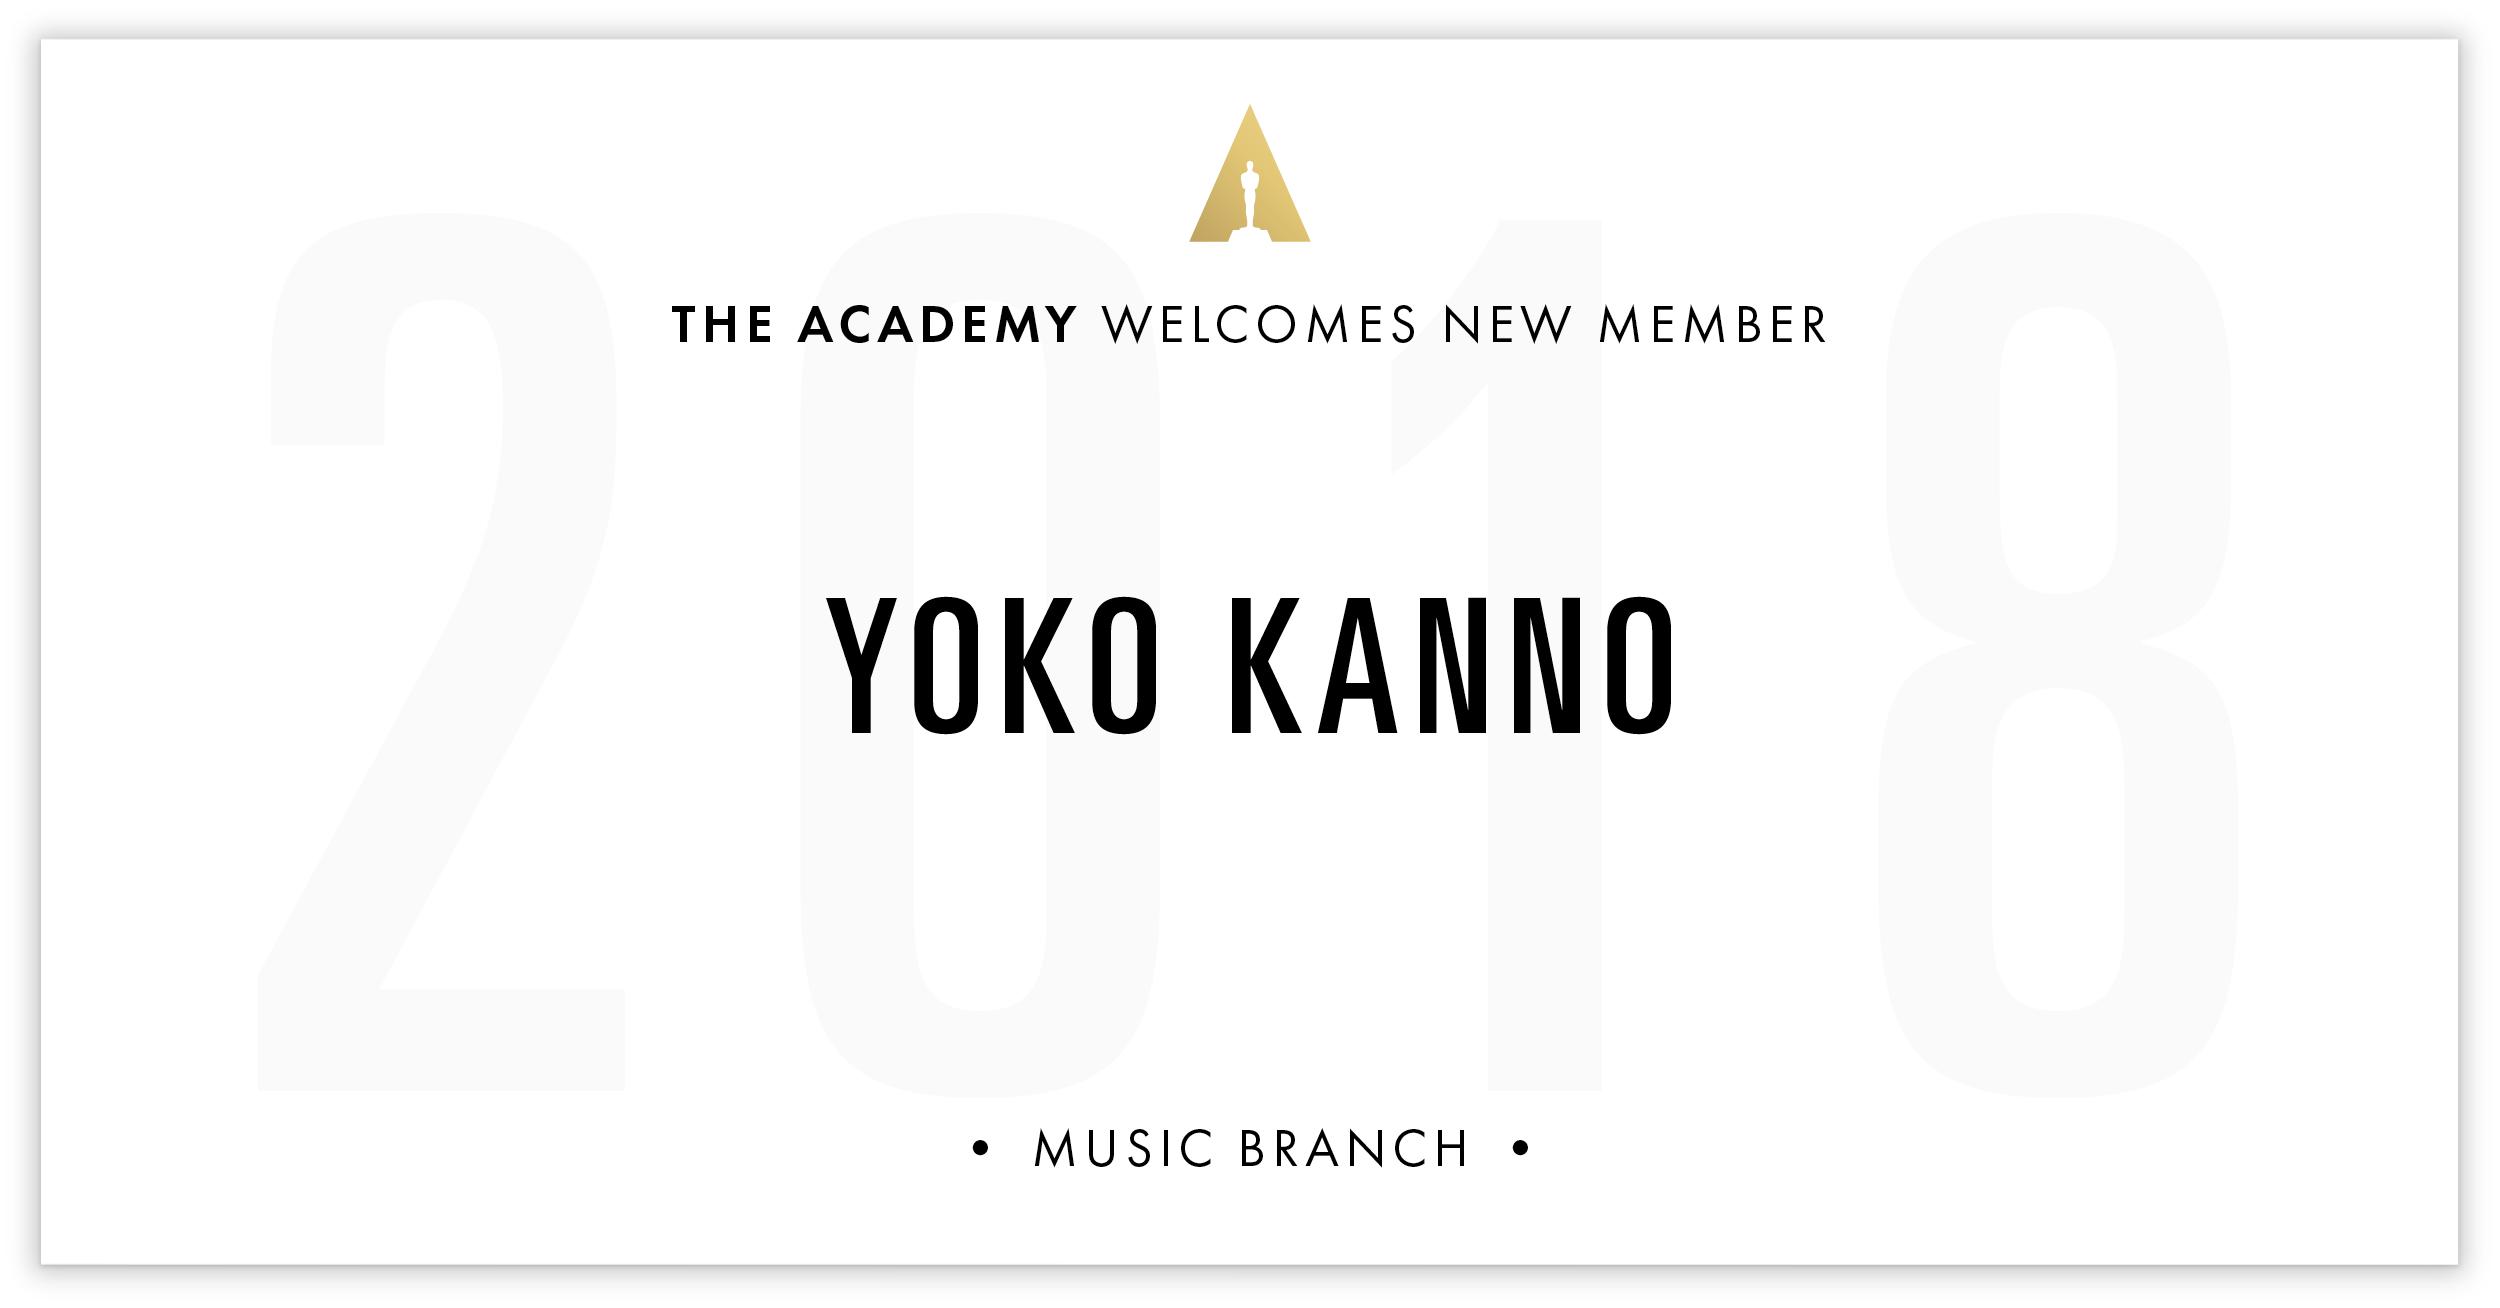 Yoko Kanno is invited!